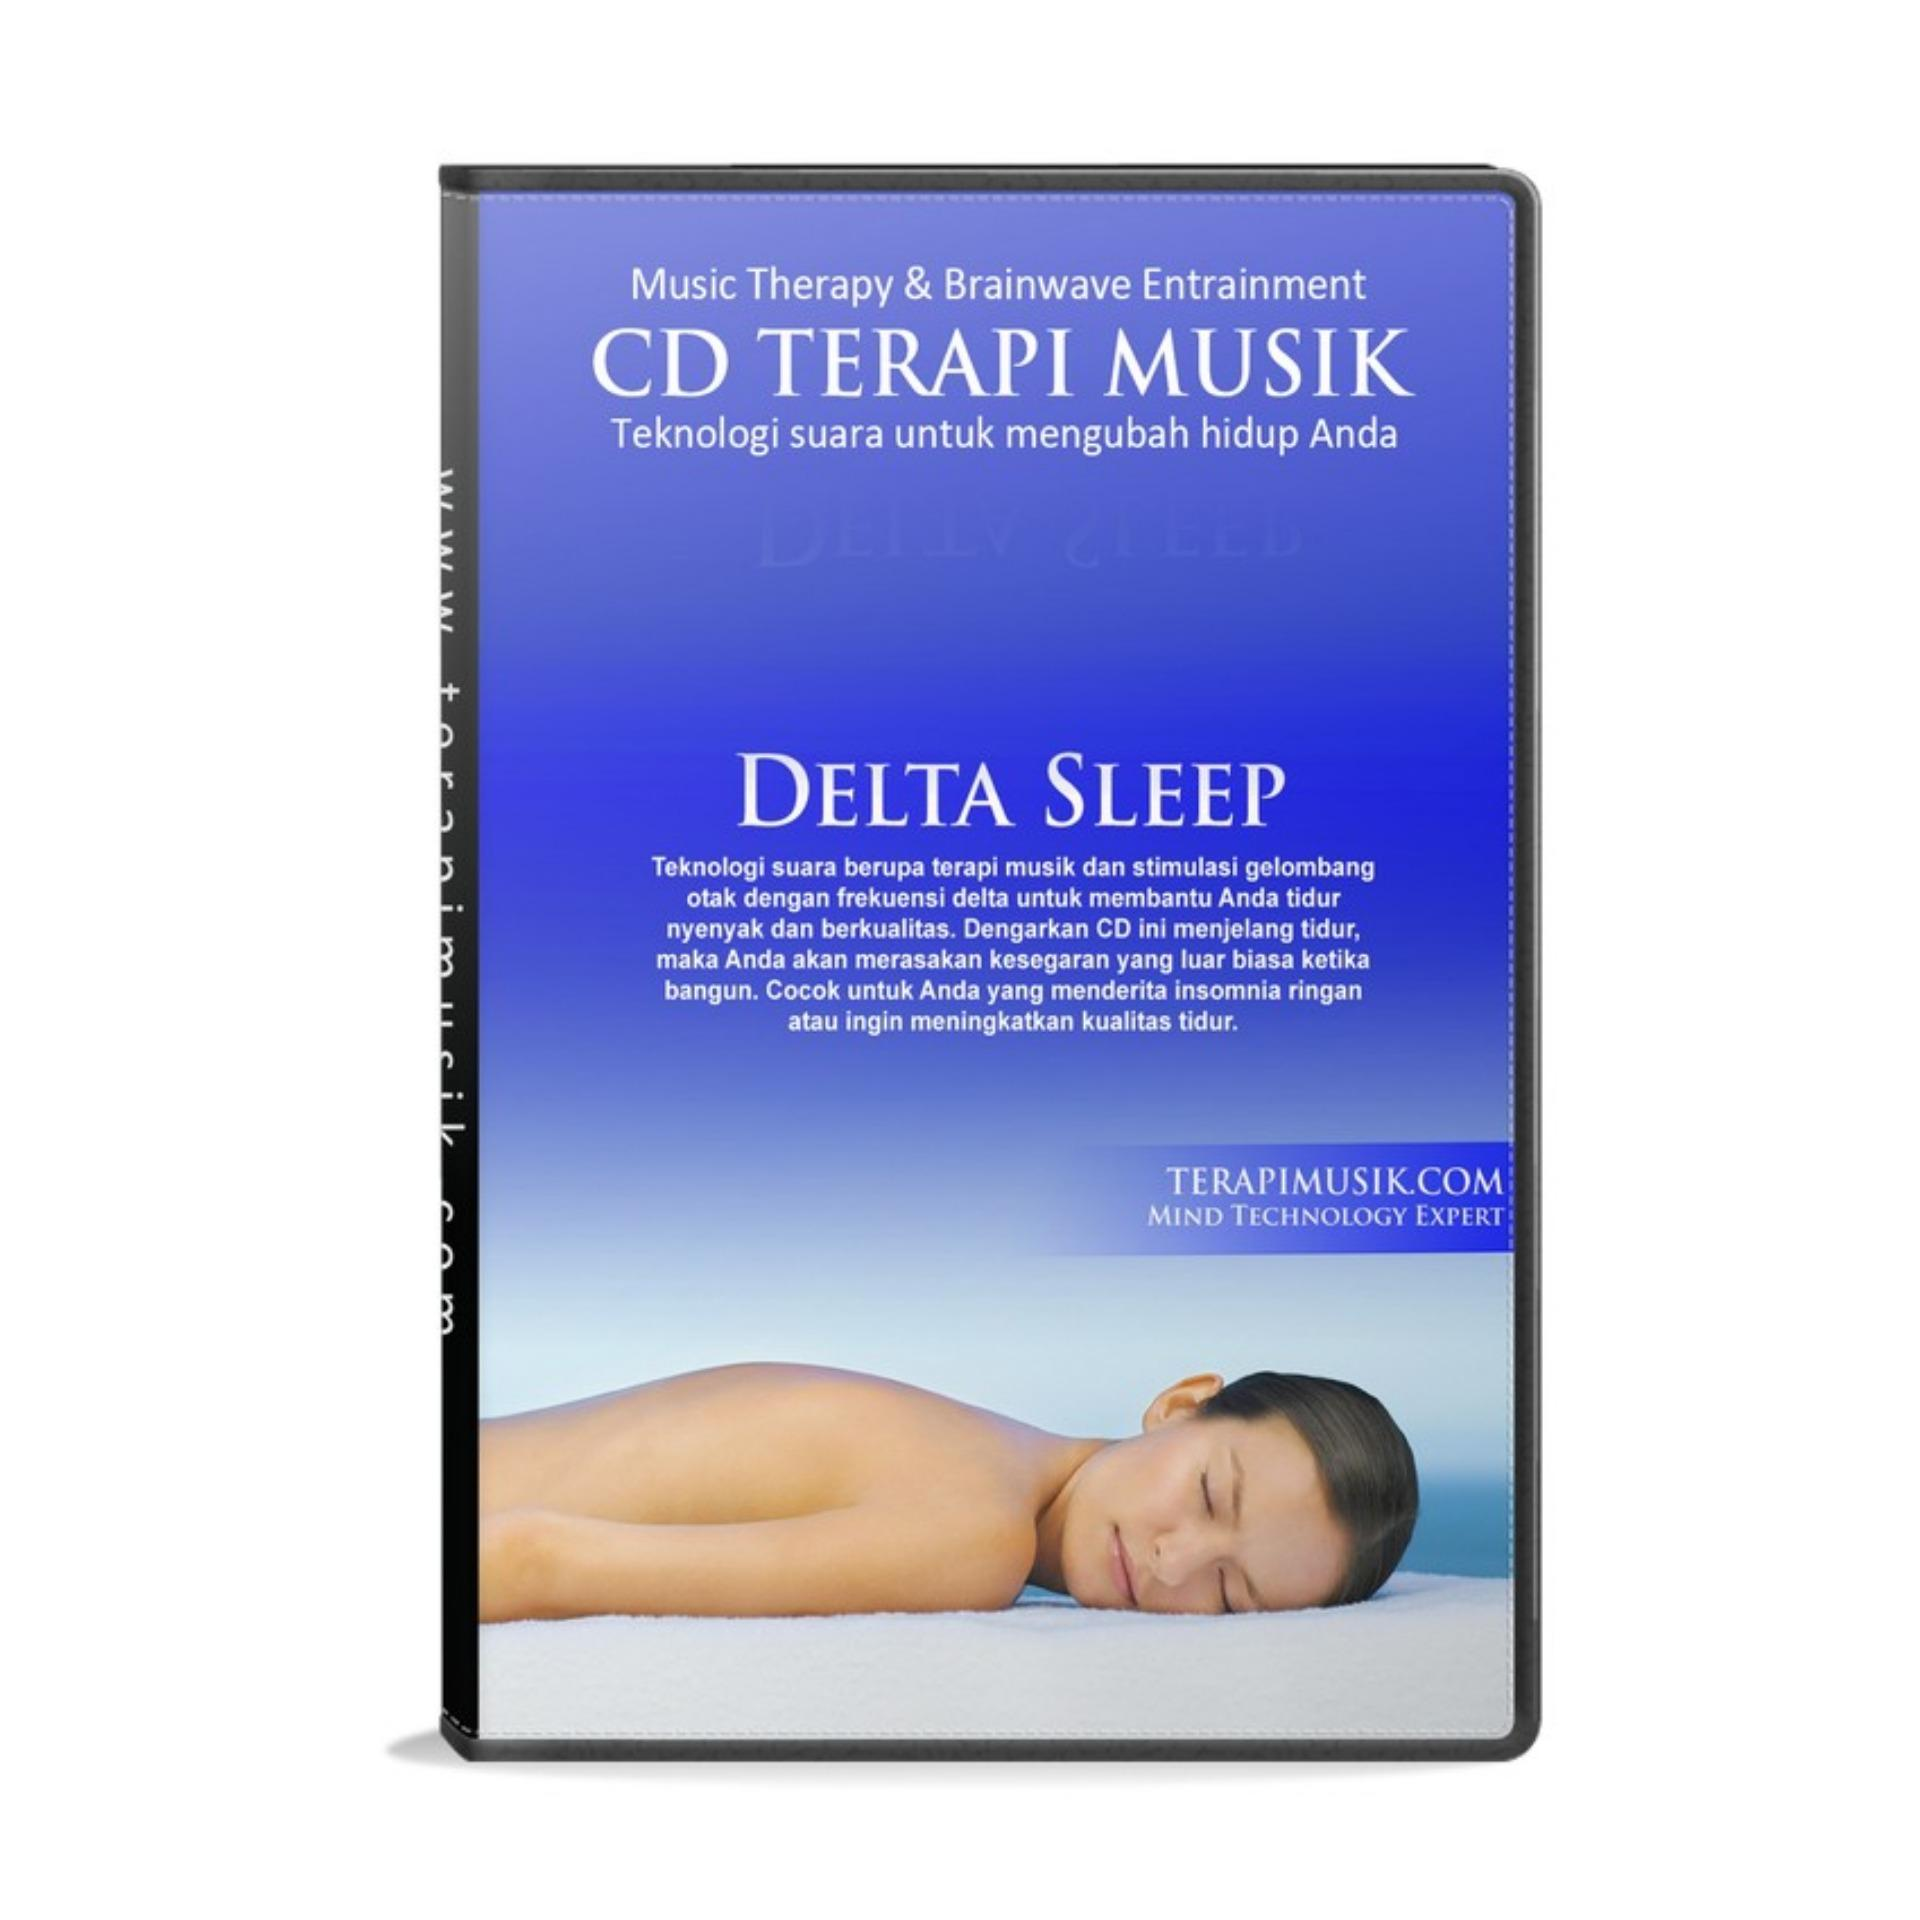 Terapi Musik Delta Sleep (meningkatkan Kualitas Tidur) By Terapi Musik.